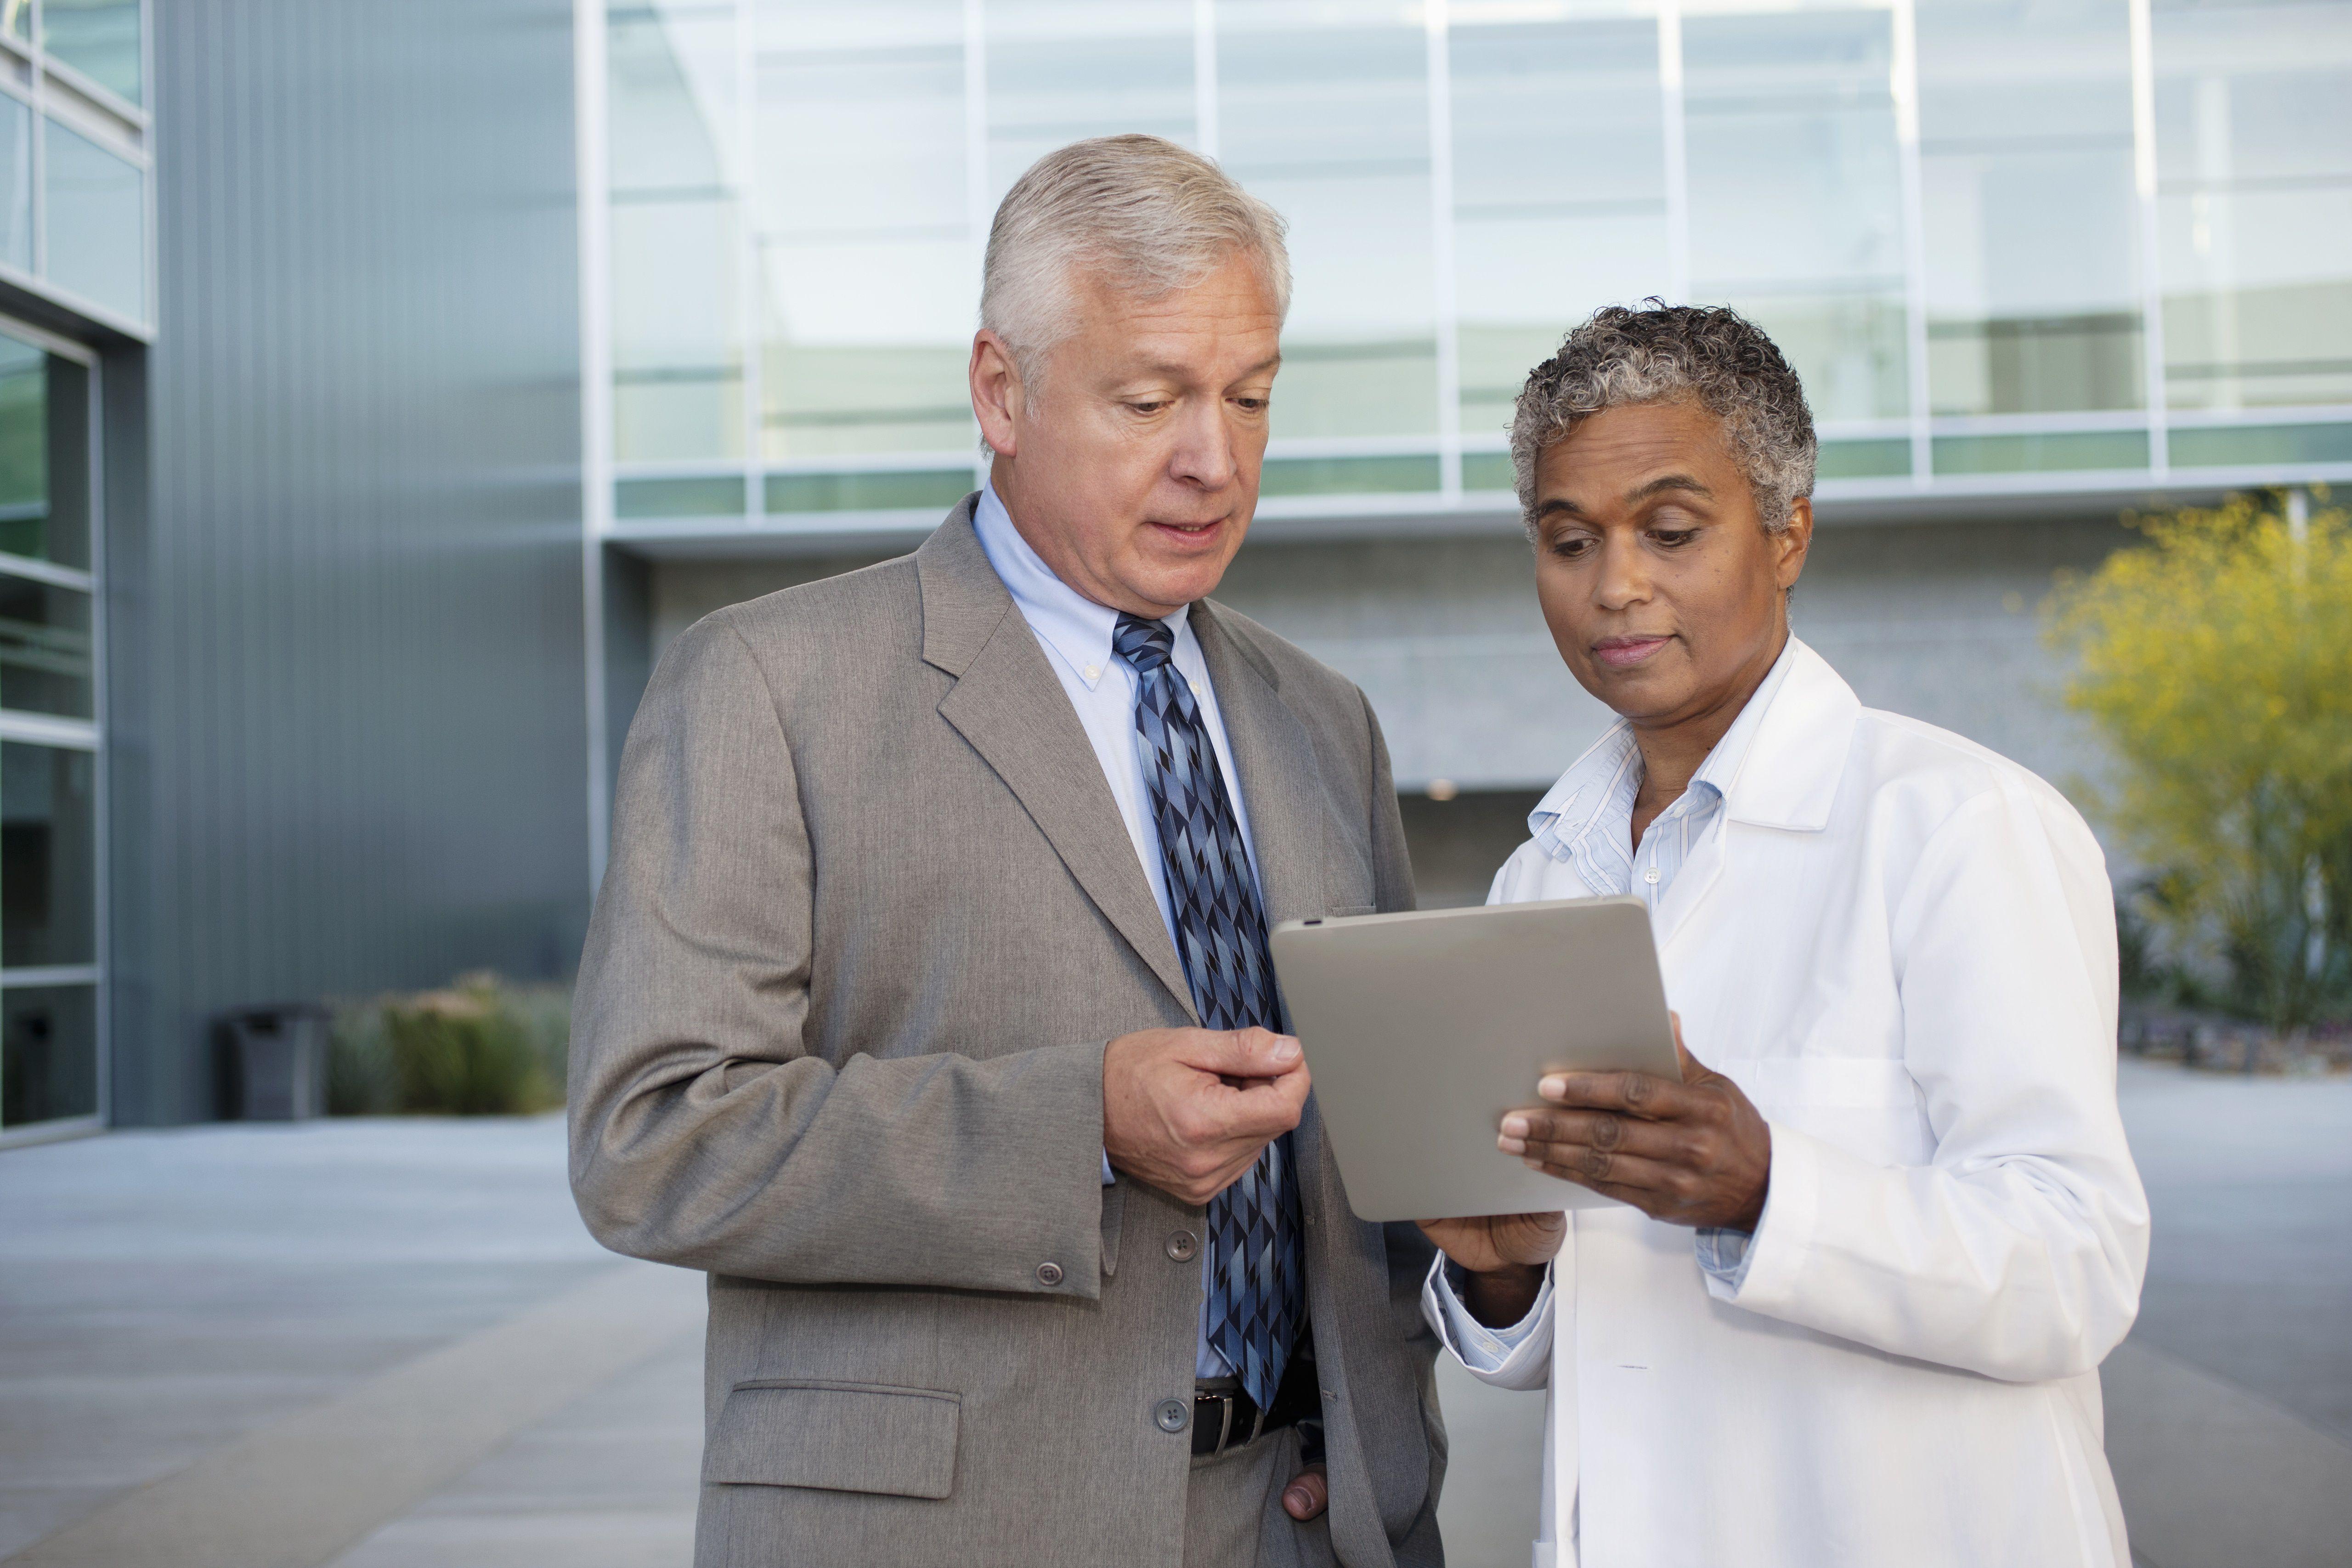 Health carehospital administrator job description salary